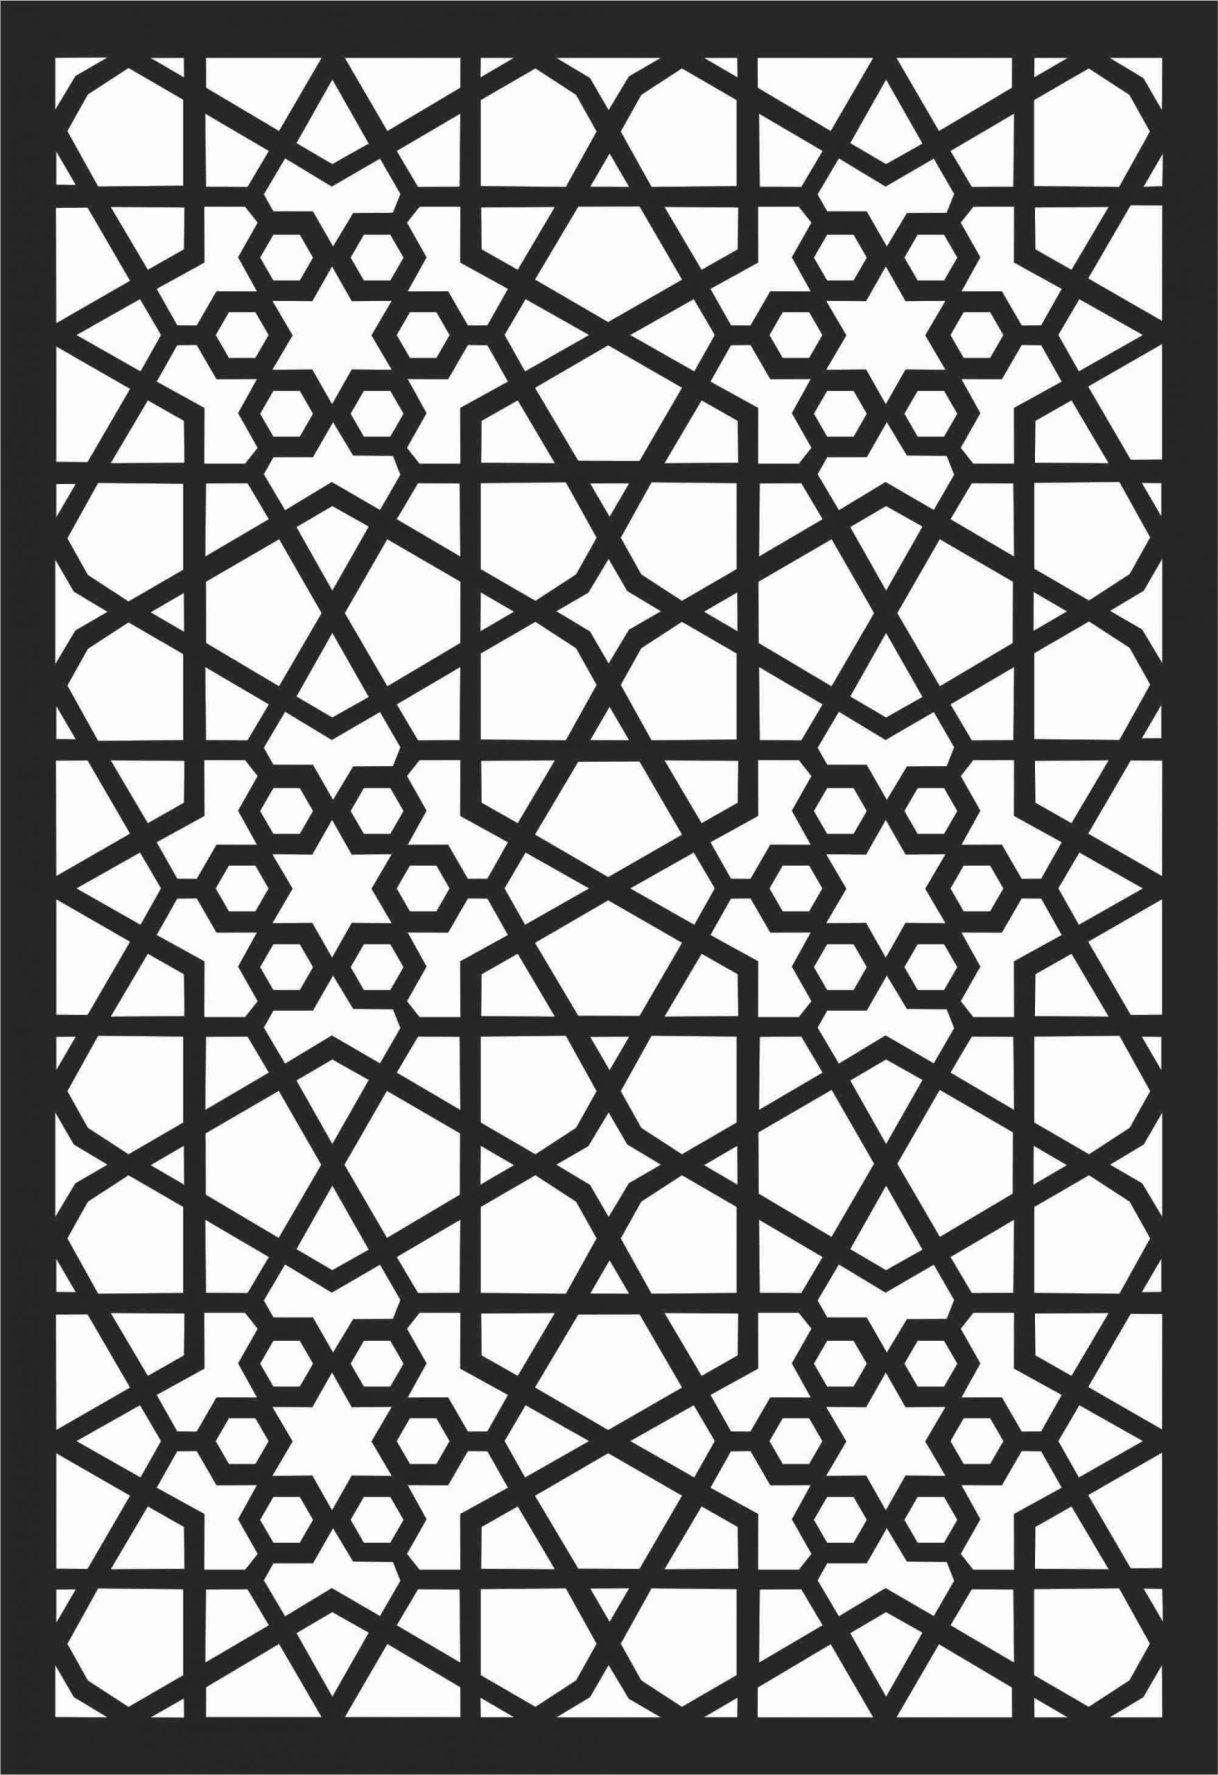 Screen Panel Patterns Seamless 29 Free DXF File